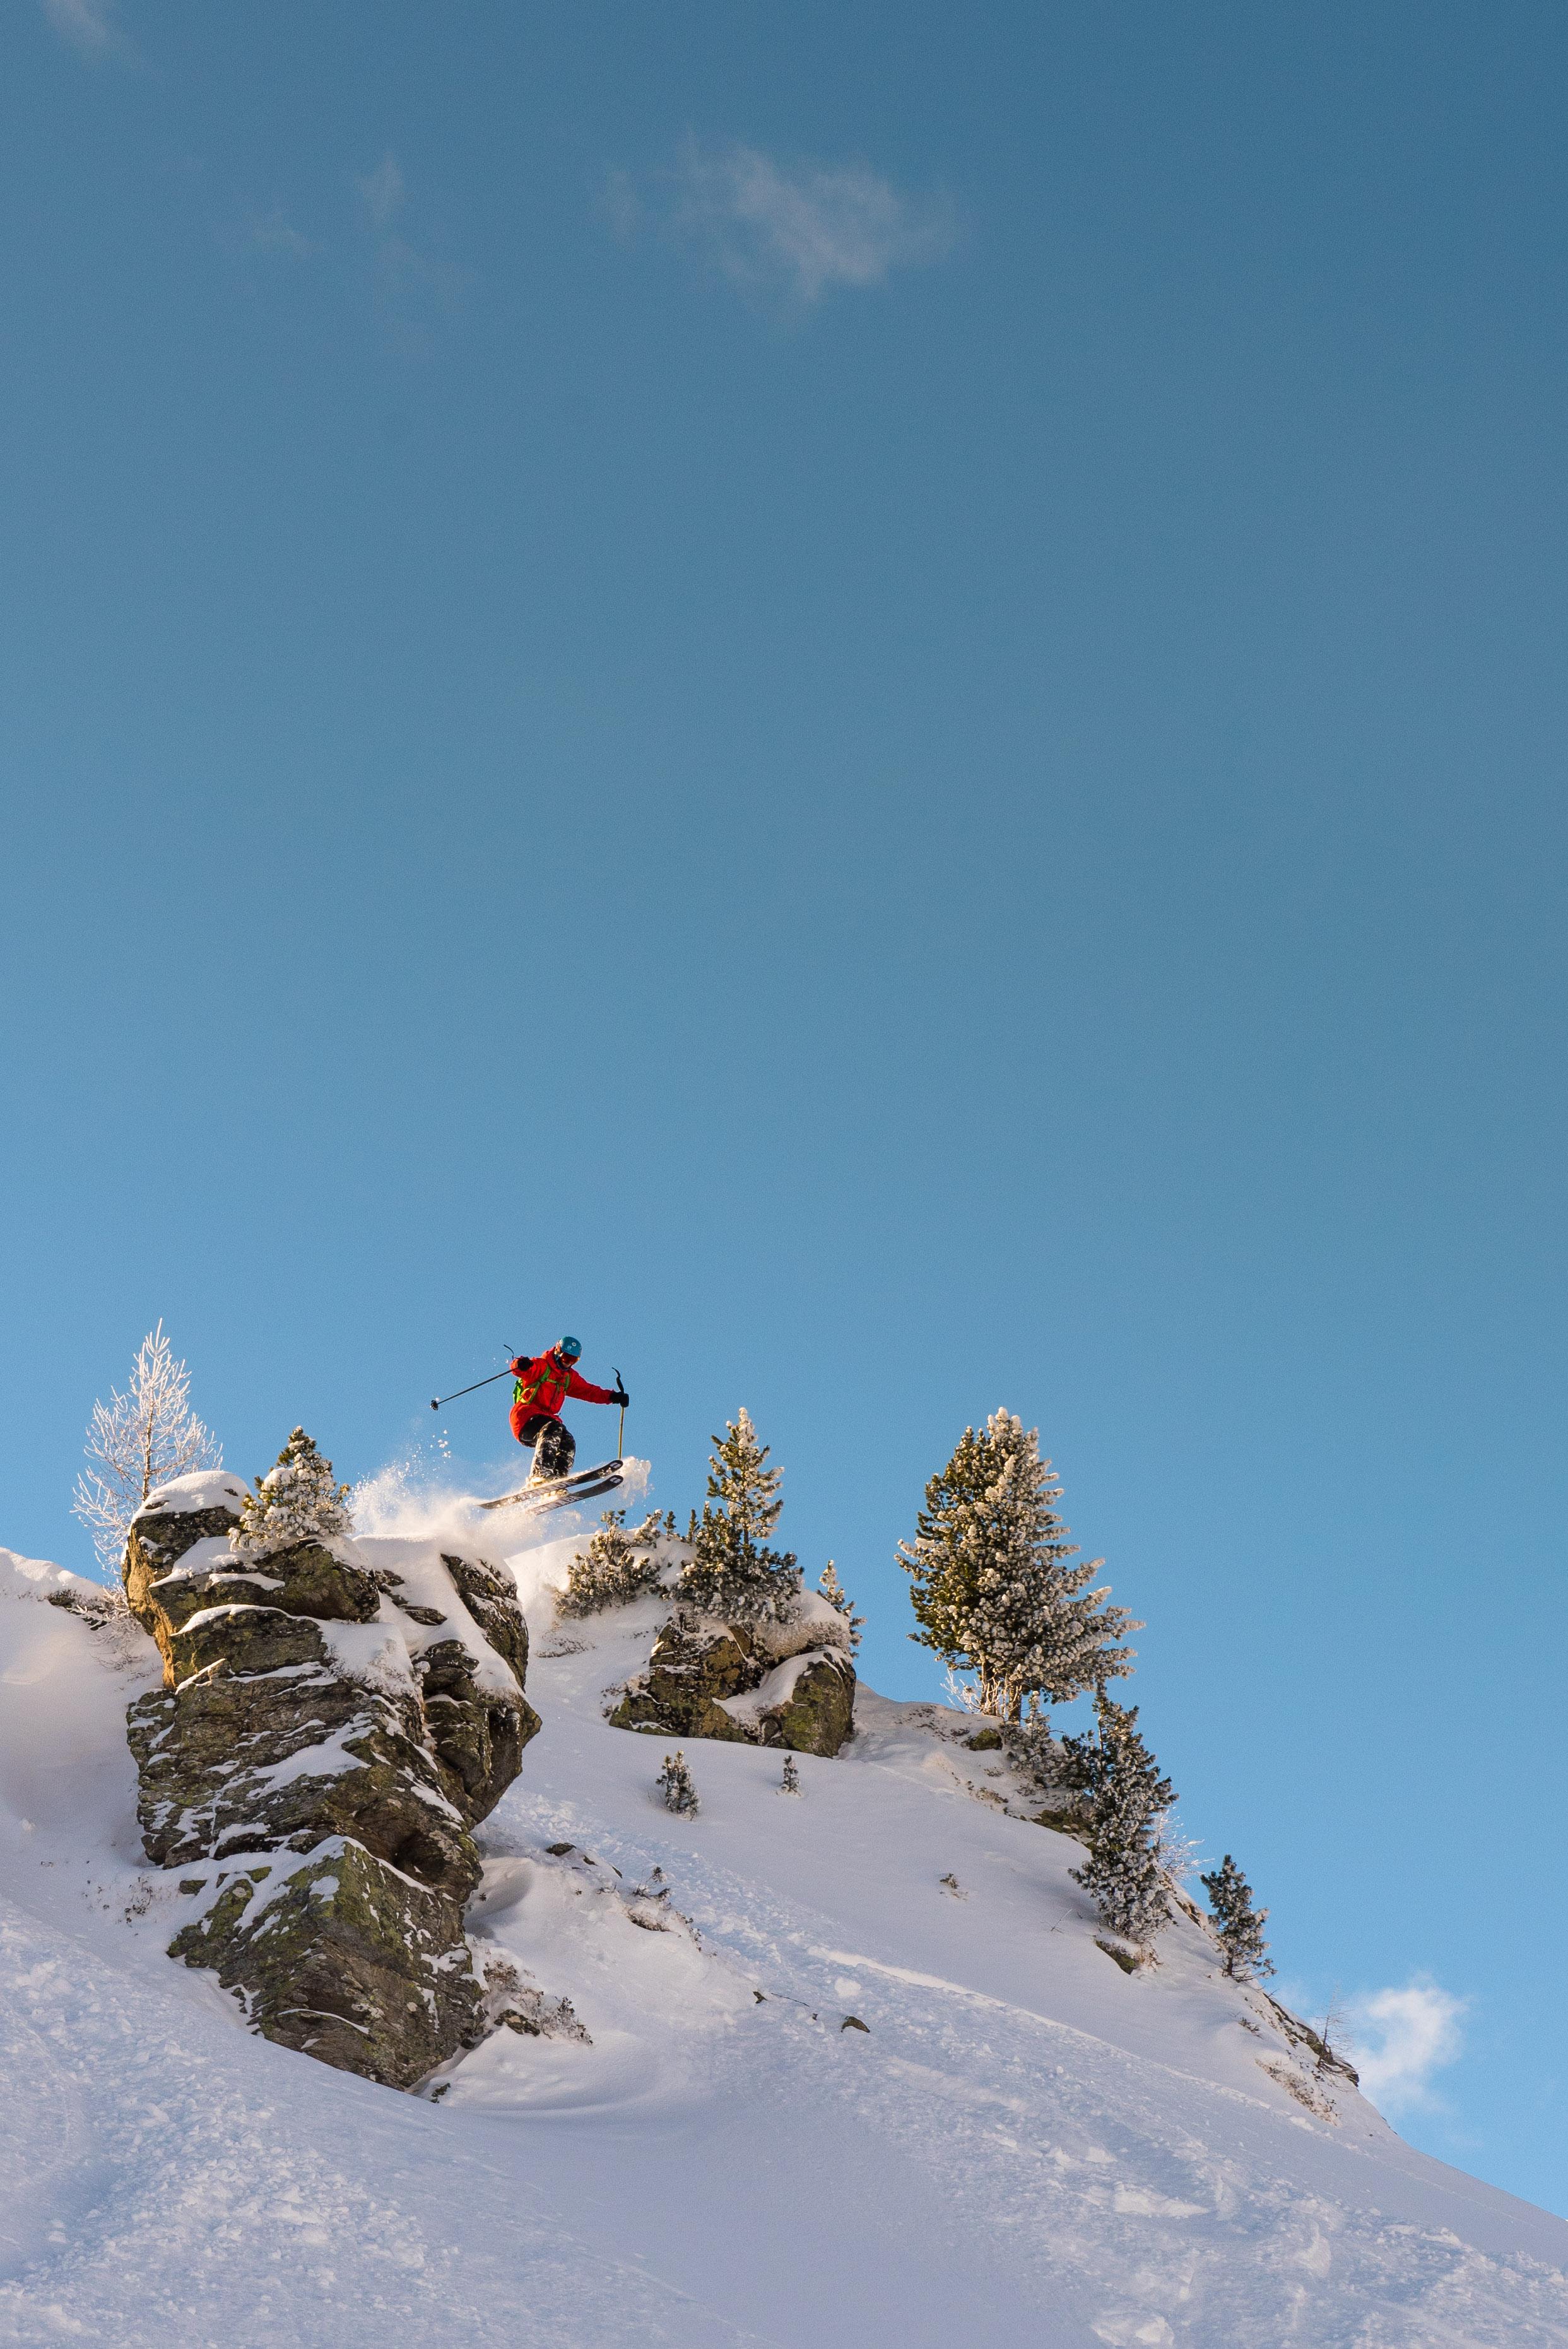 redbull-illume-submission-gustav-thuesen-photographer-fotograf-video-photo-foto-action-sports-adventure-travel-11.jpg